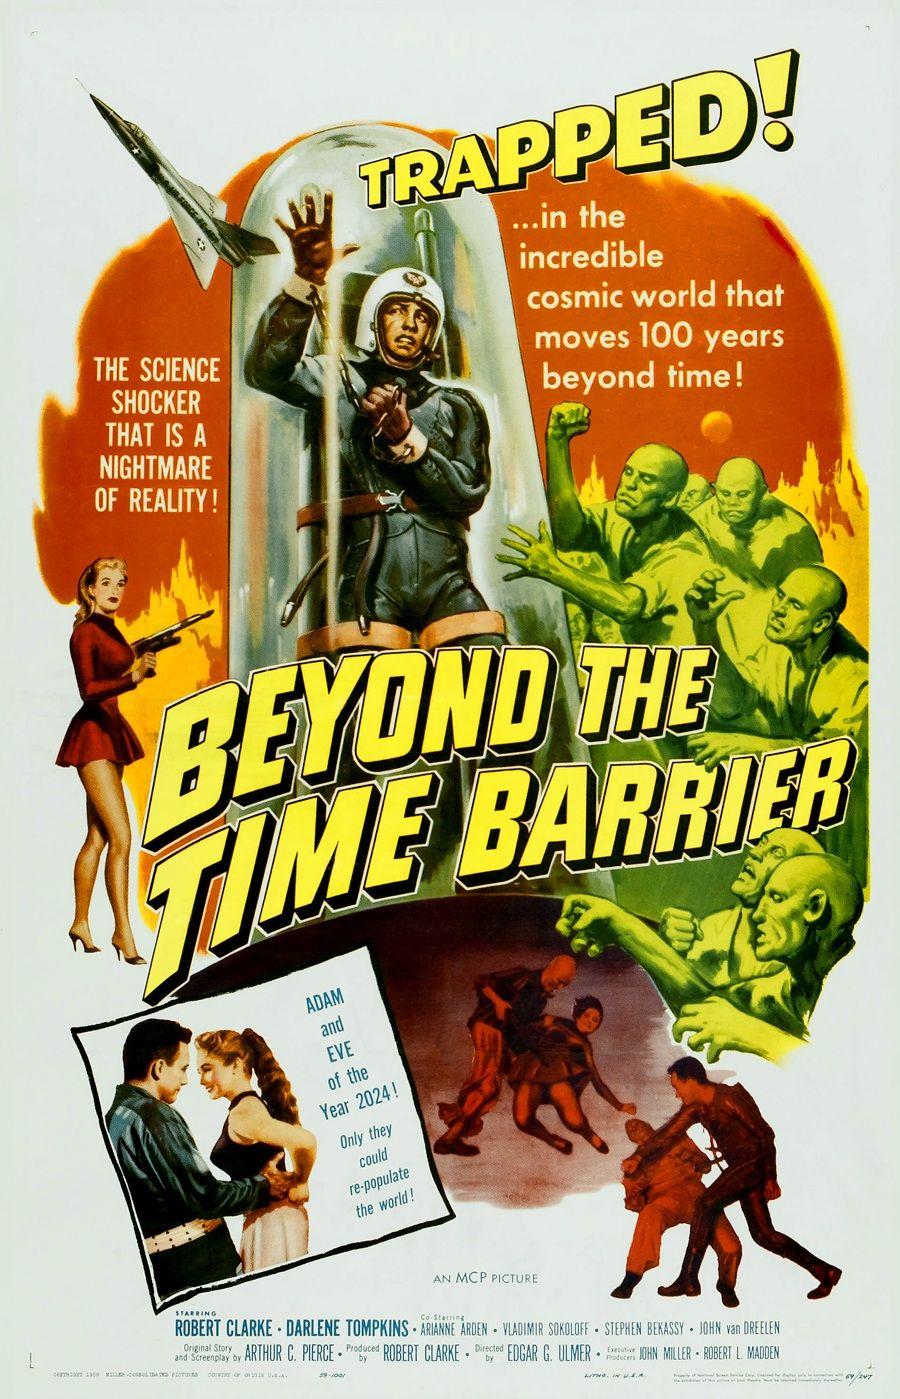 Vintage sci fi movie posters